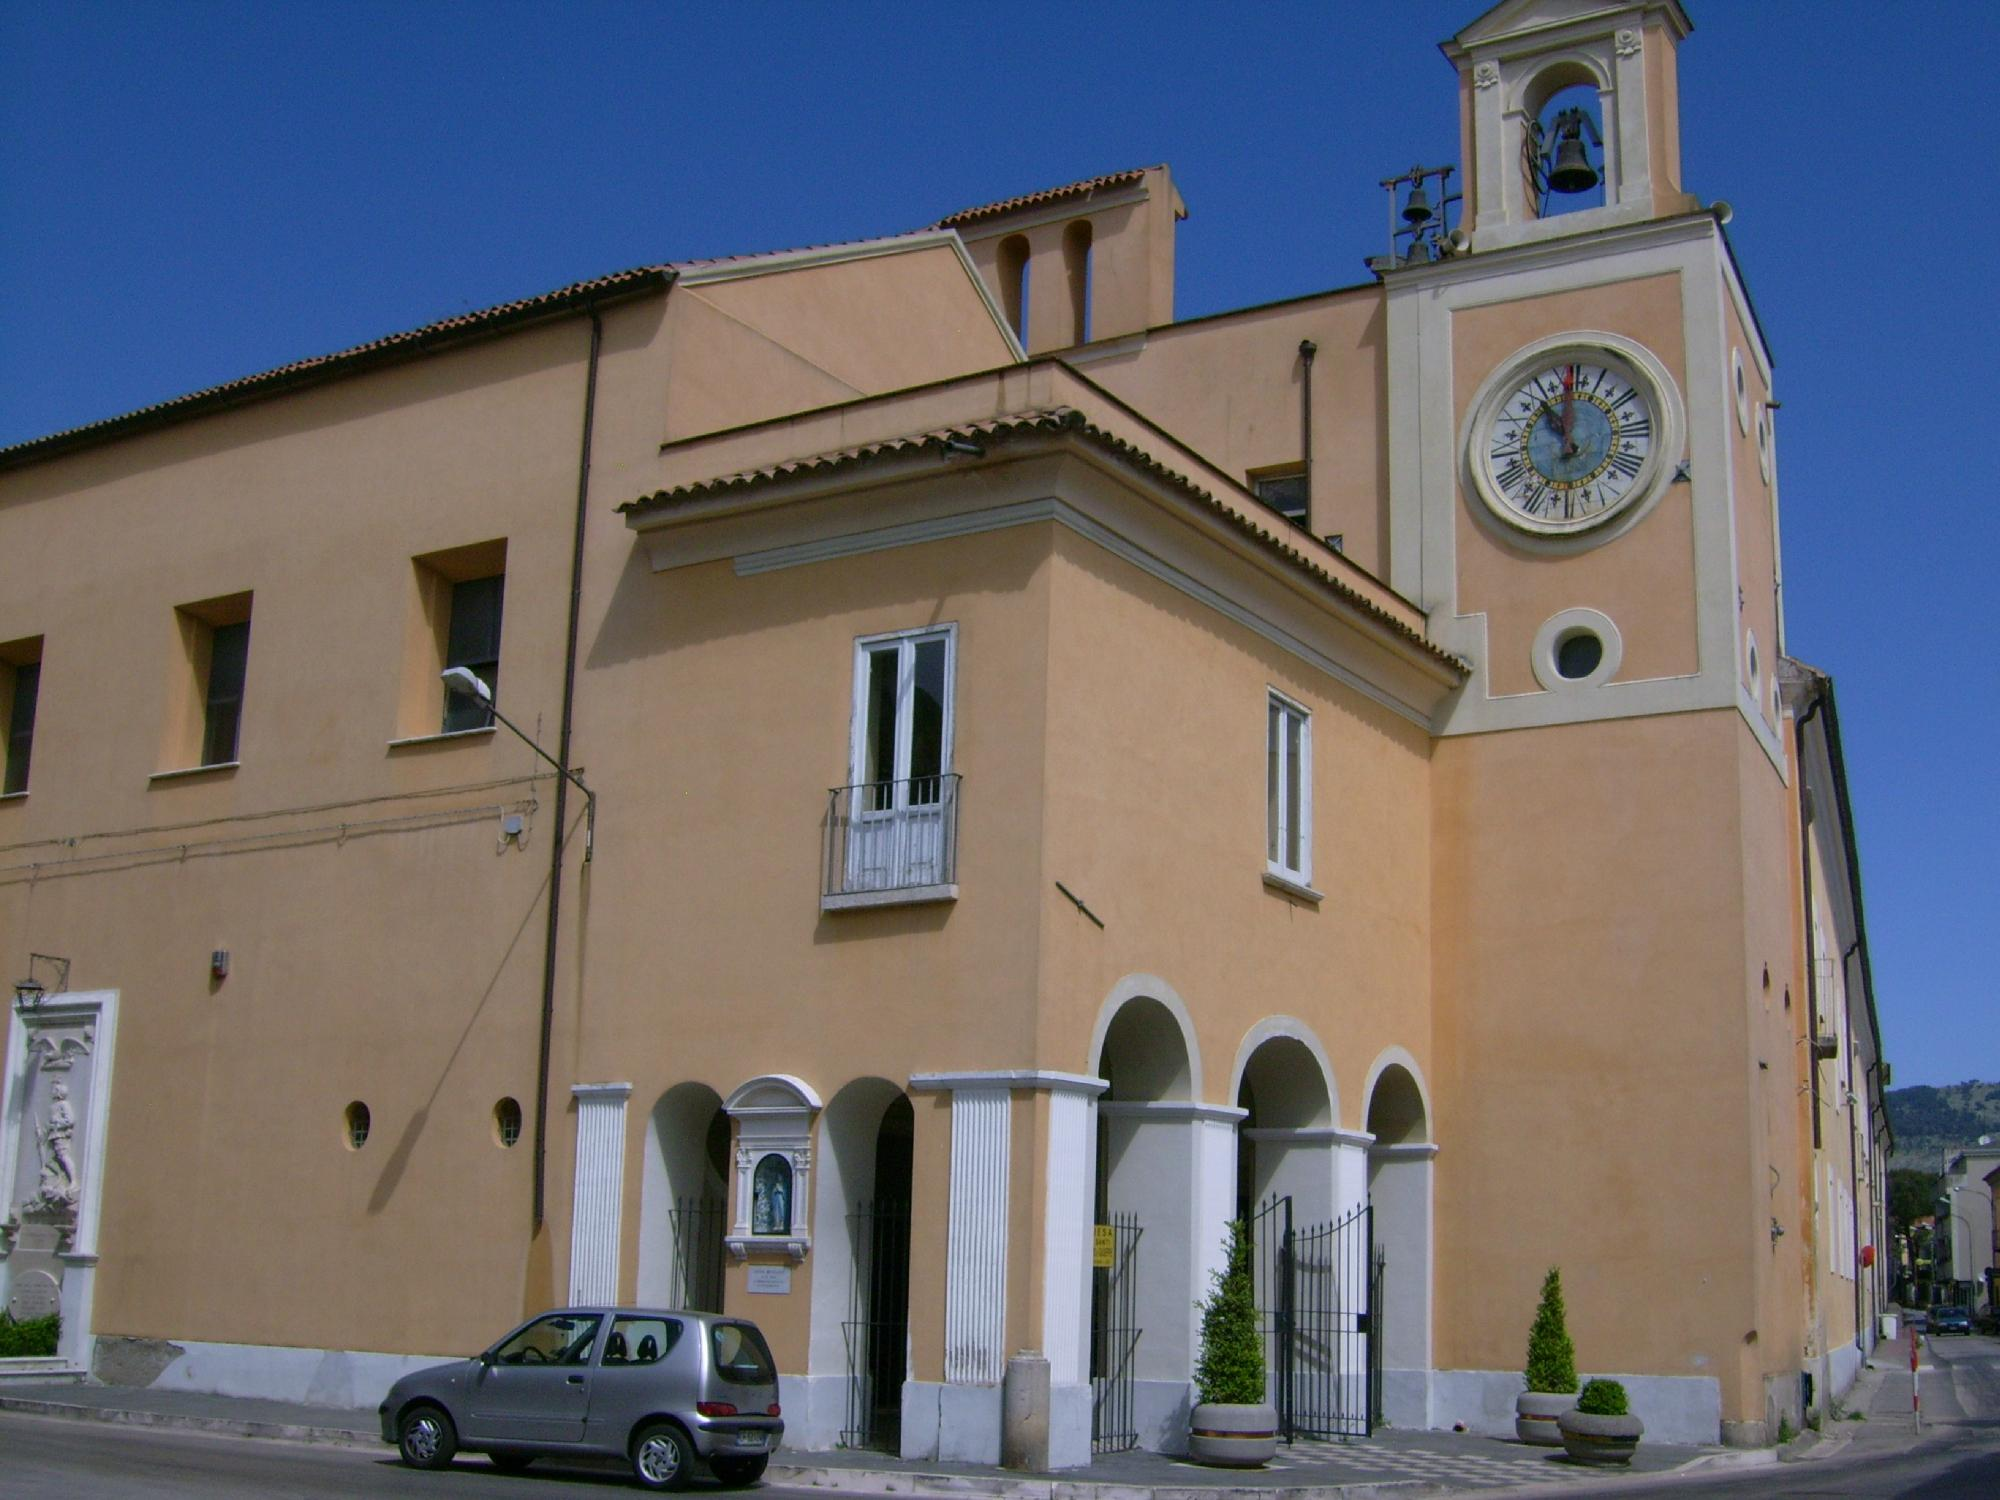 Chiesa dei Santi Gennaro e Giuseppe